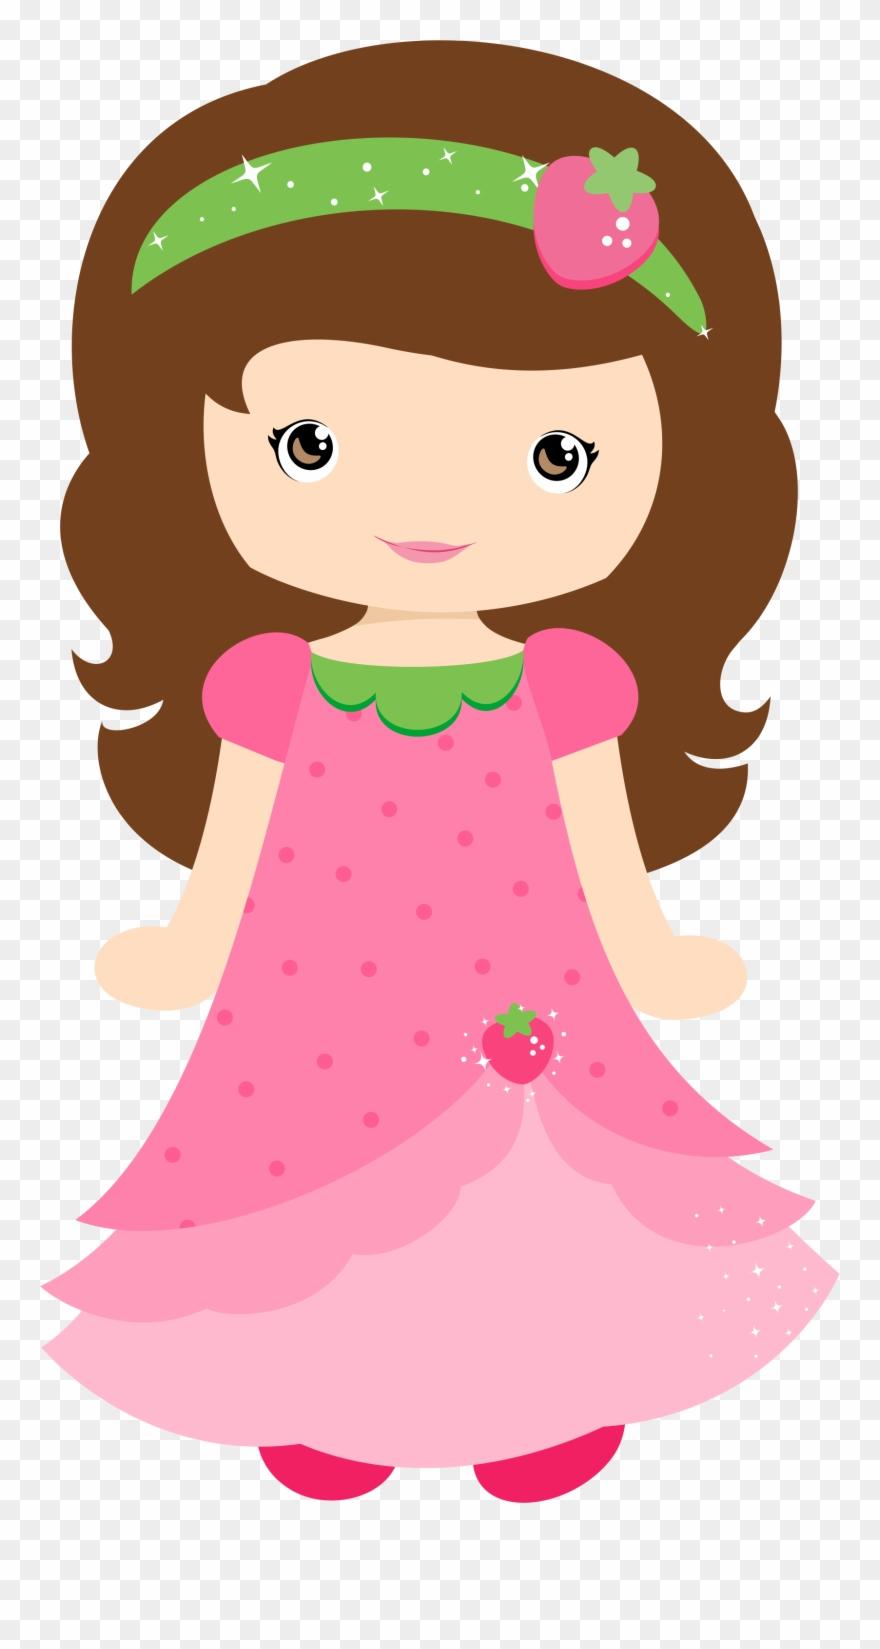 hight resolution of cute clipart girl clipart cute dolls cute kids desenho de boneca